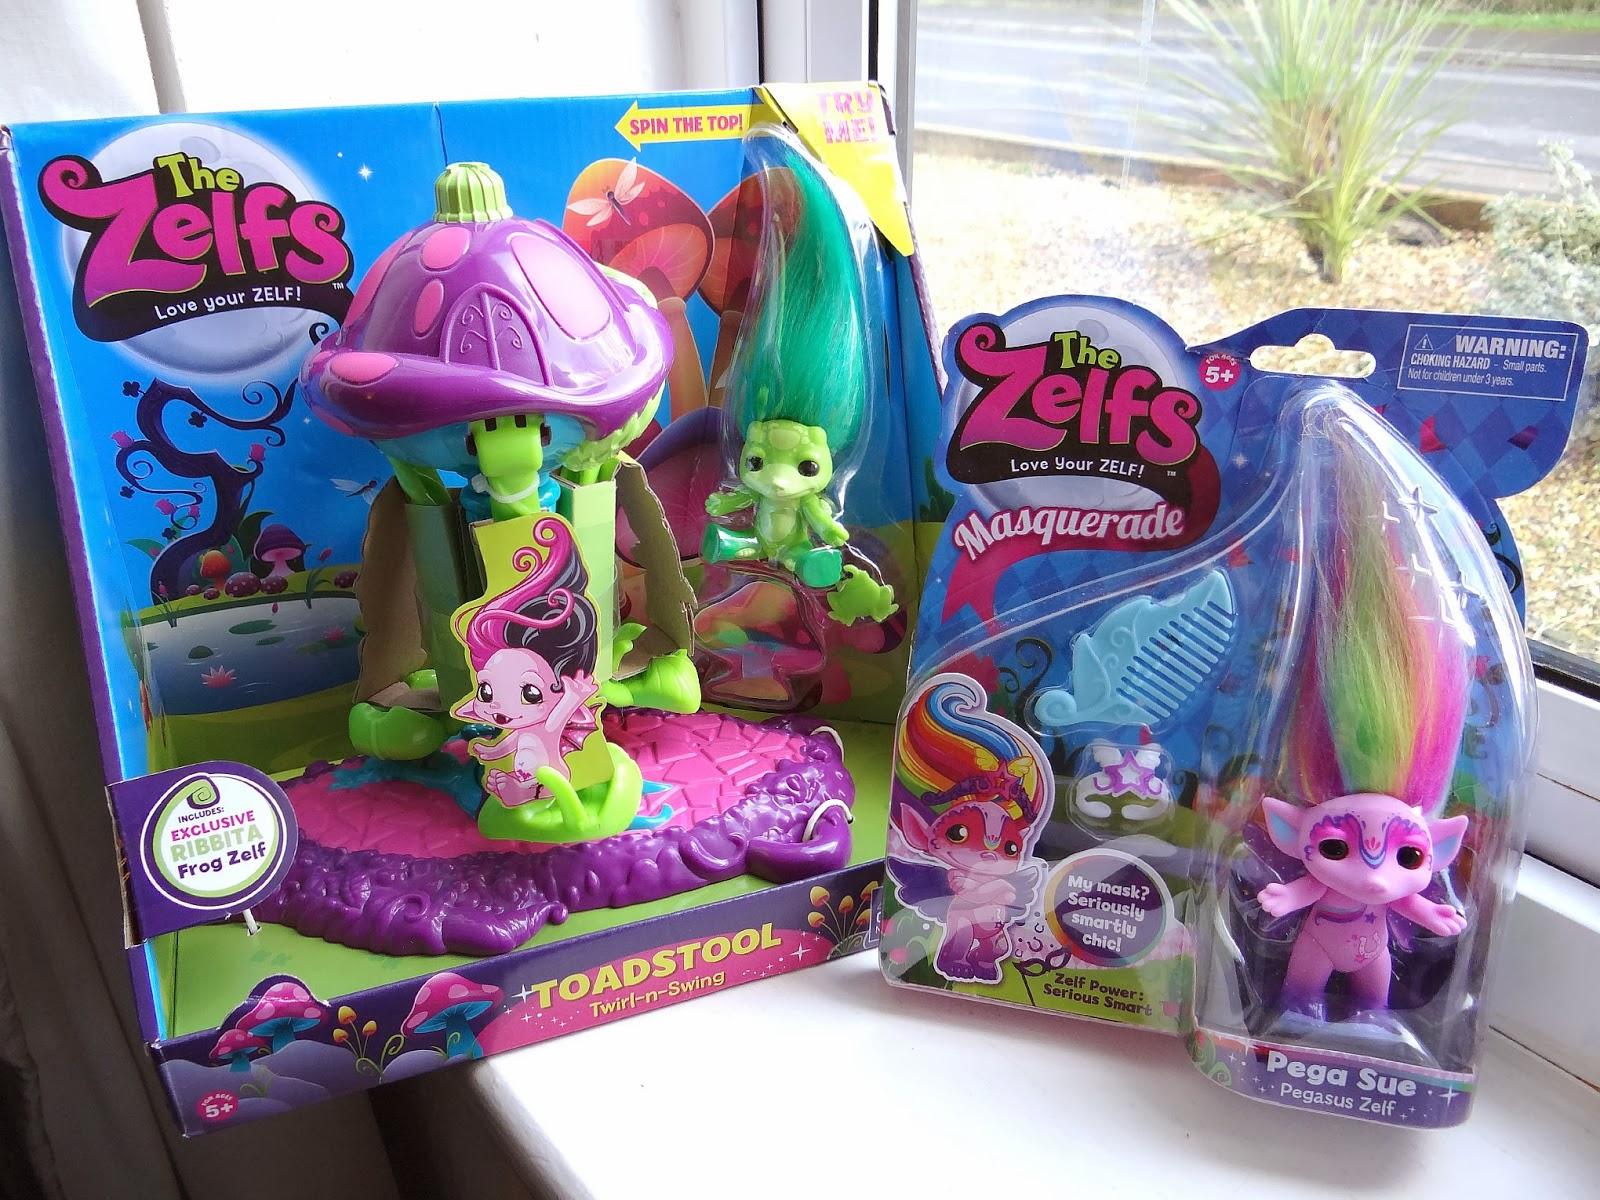 The Zelfs Masquerade, Ultra Rare Zelf Ruby, The Zelfs Toadstool Twirl-n-Swing Playset